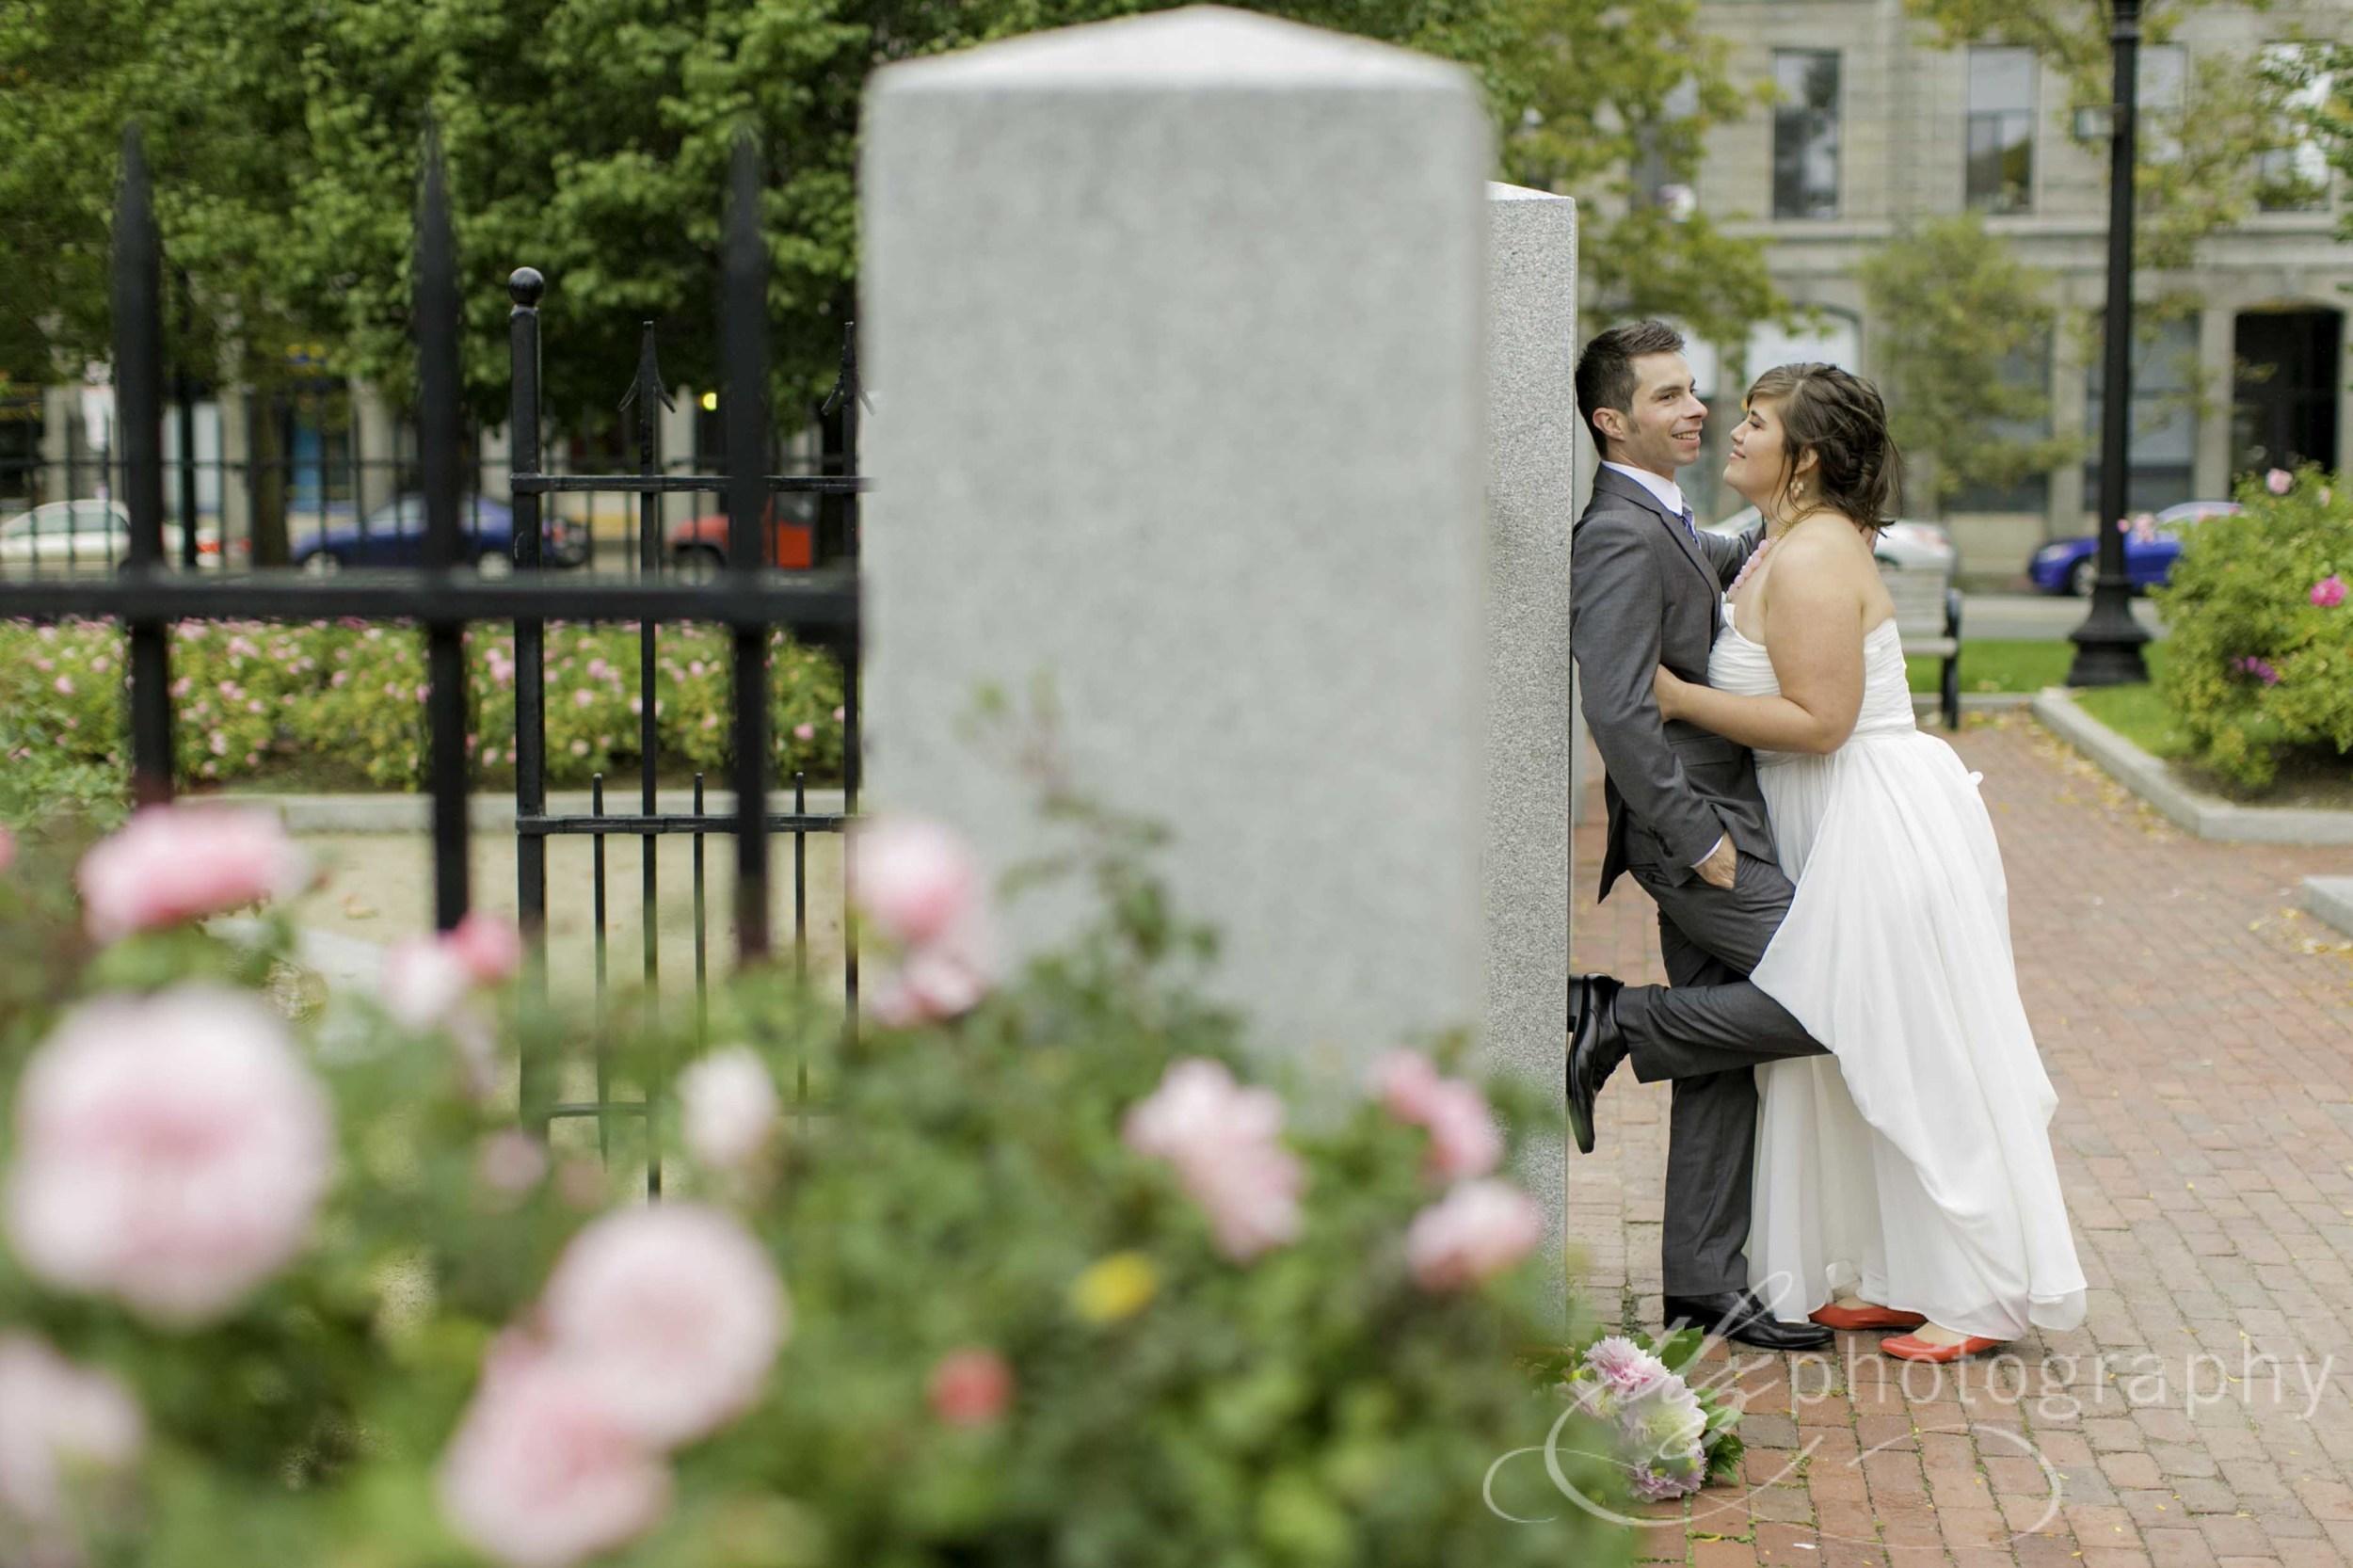 TLZ14224144_Amy & Aaron Wedding.jpg